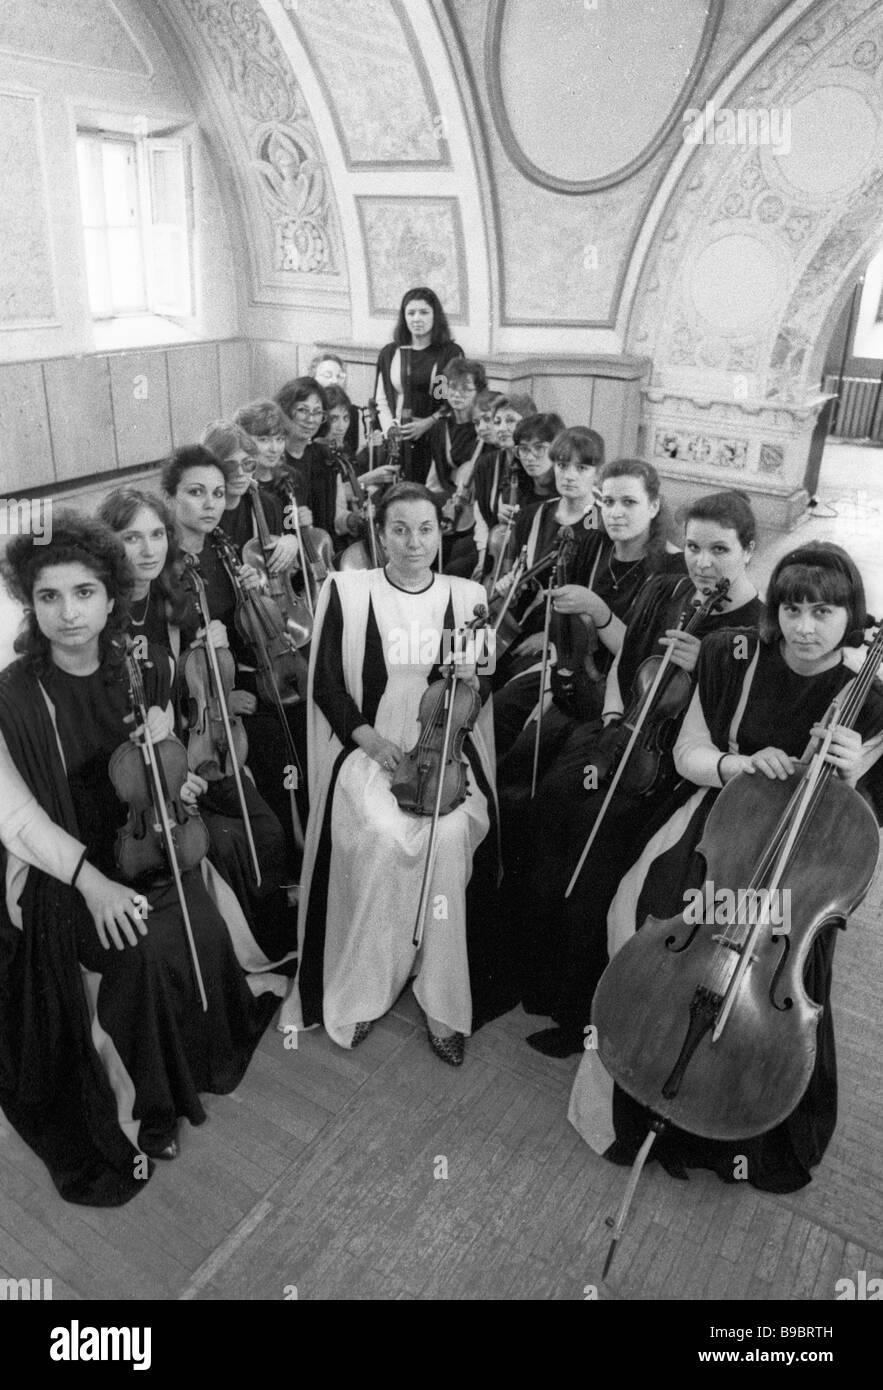 Svetlana Bezrodnaya center established the Vivaldi Orchestra i e ladies chamber orchestra - Stock Image